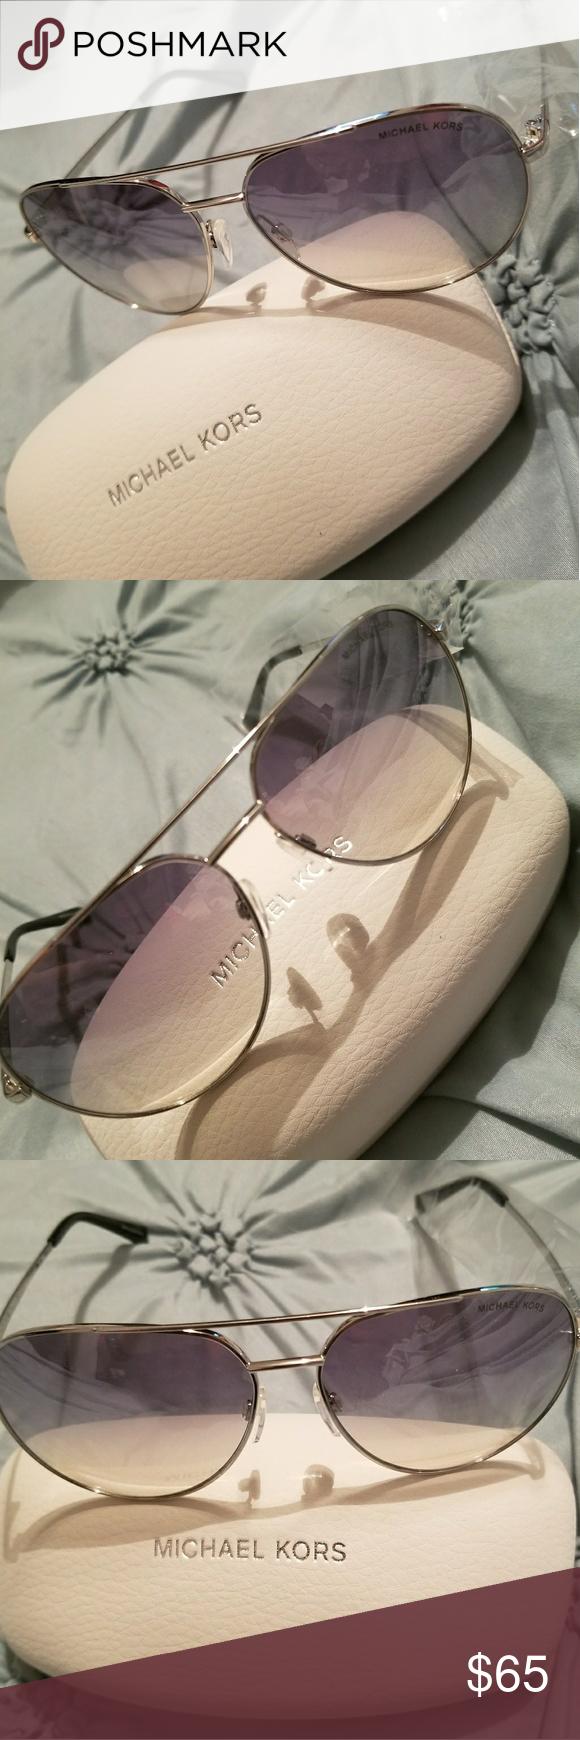 Michael Kors so glasses Aviator style glasses. Michael Kors Accessories Glasses